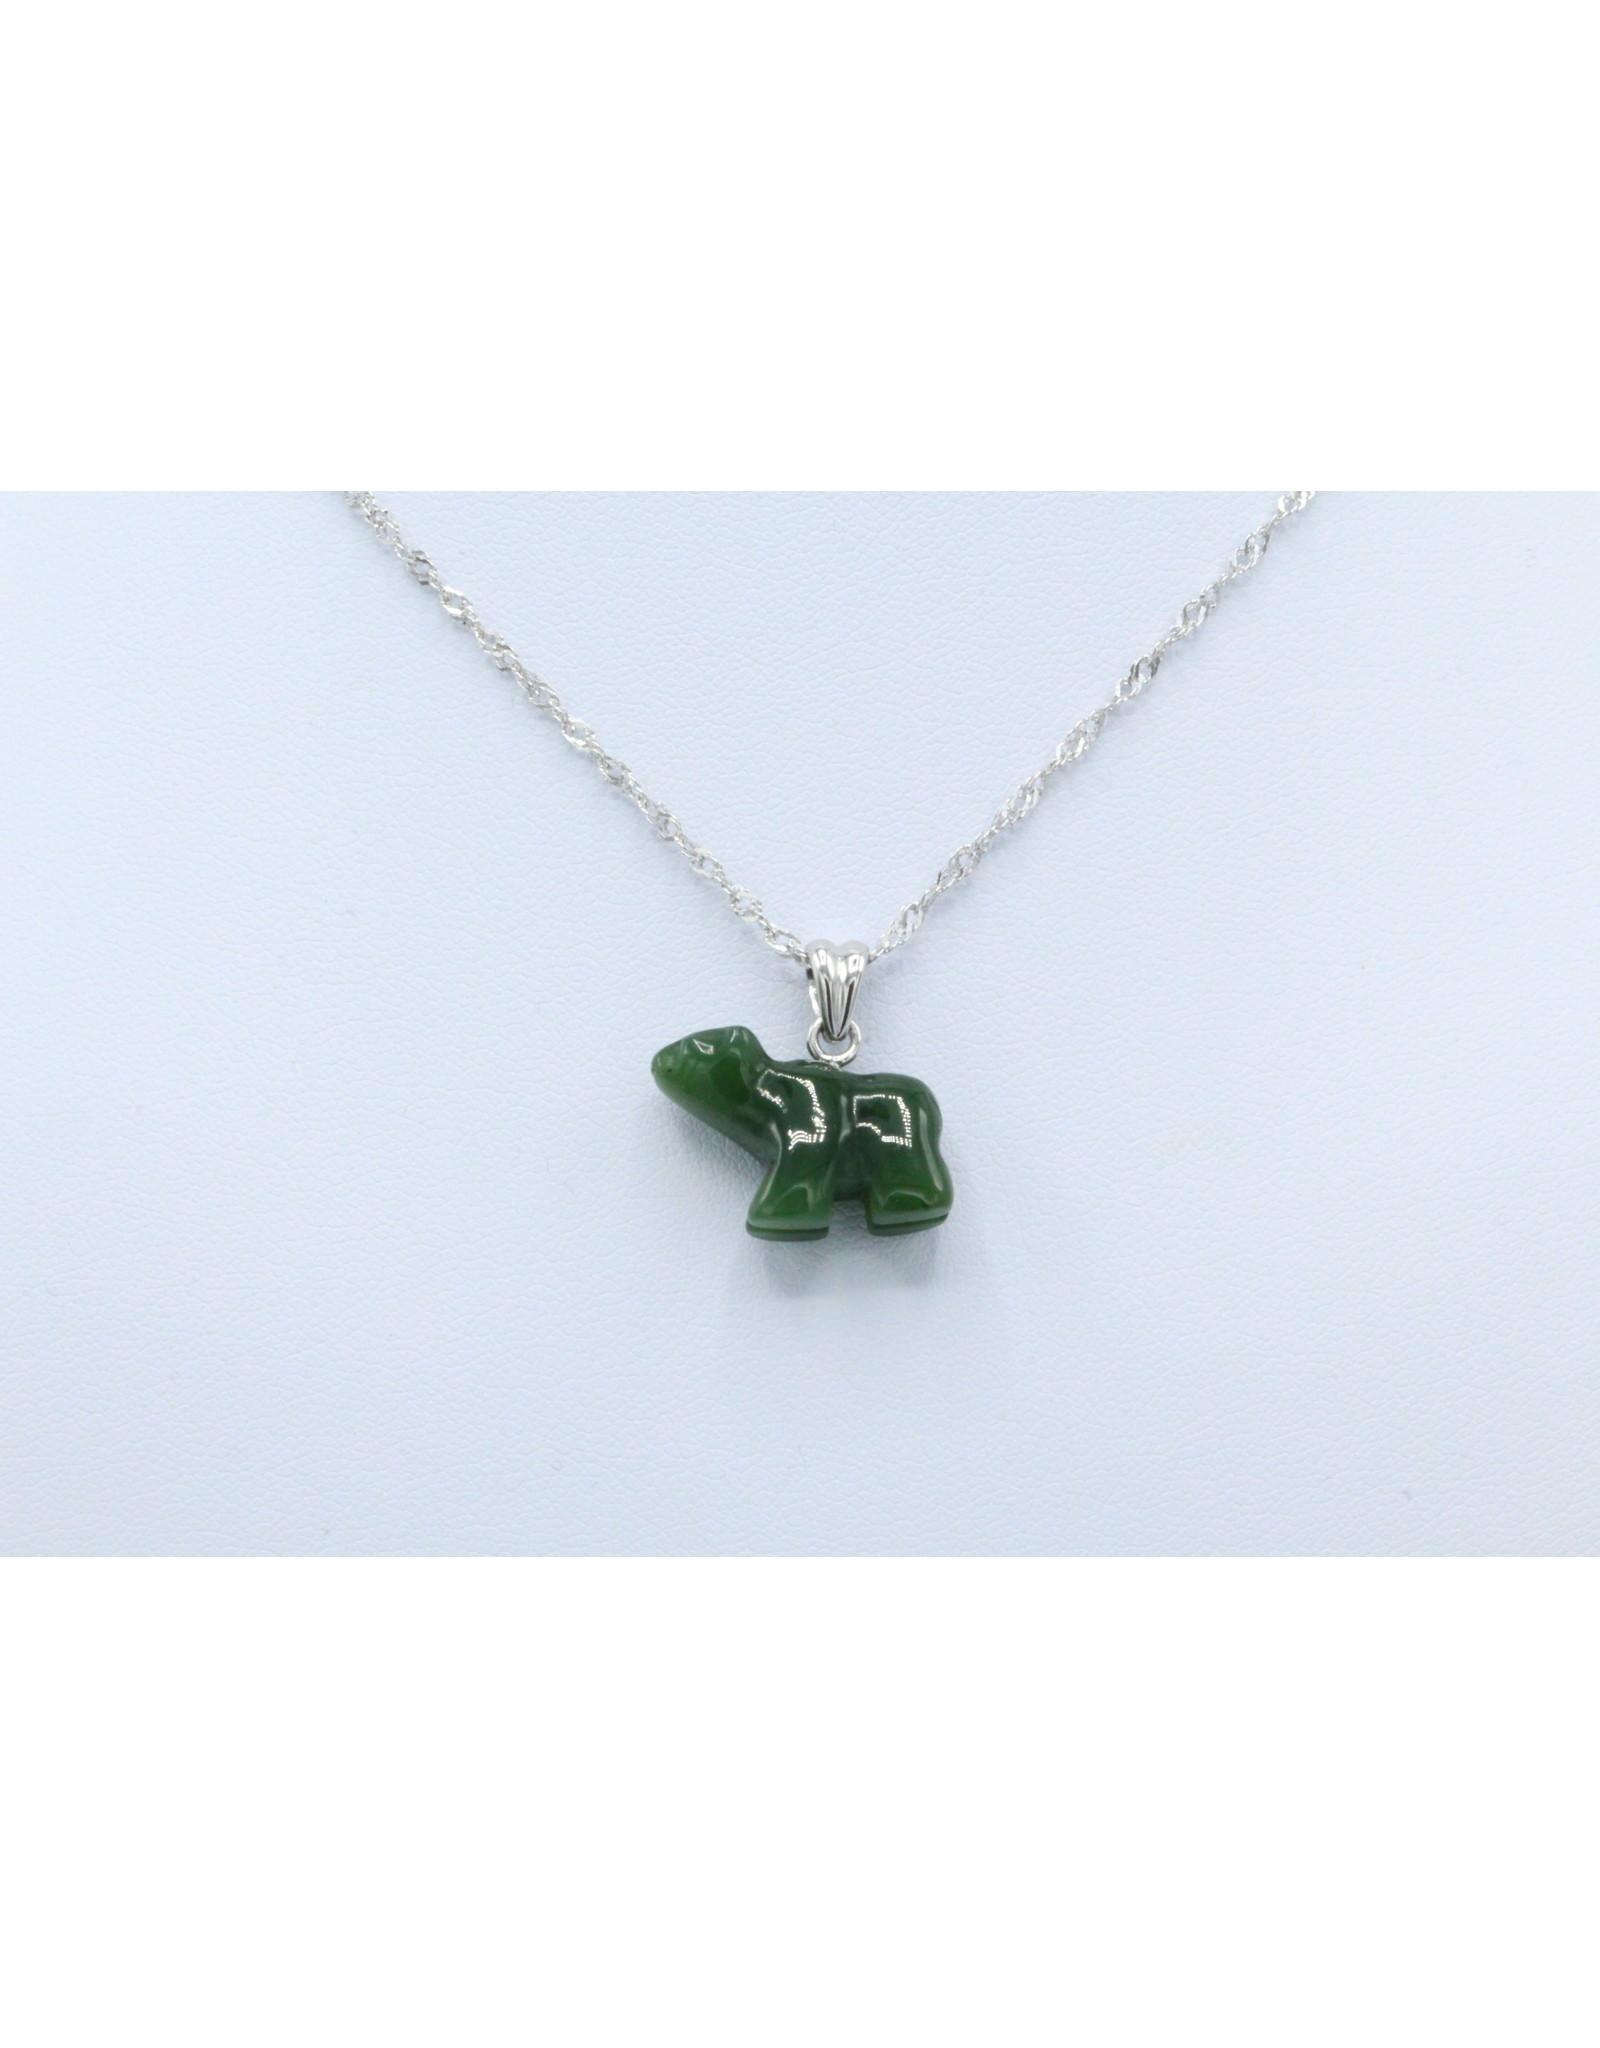 Jade Bear Necklace - JPS59